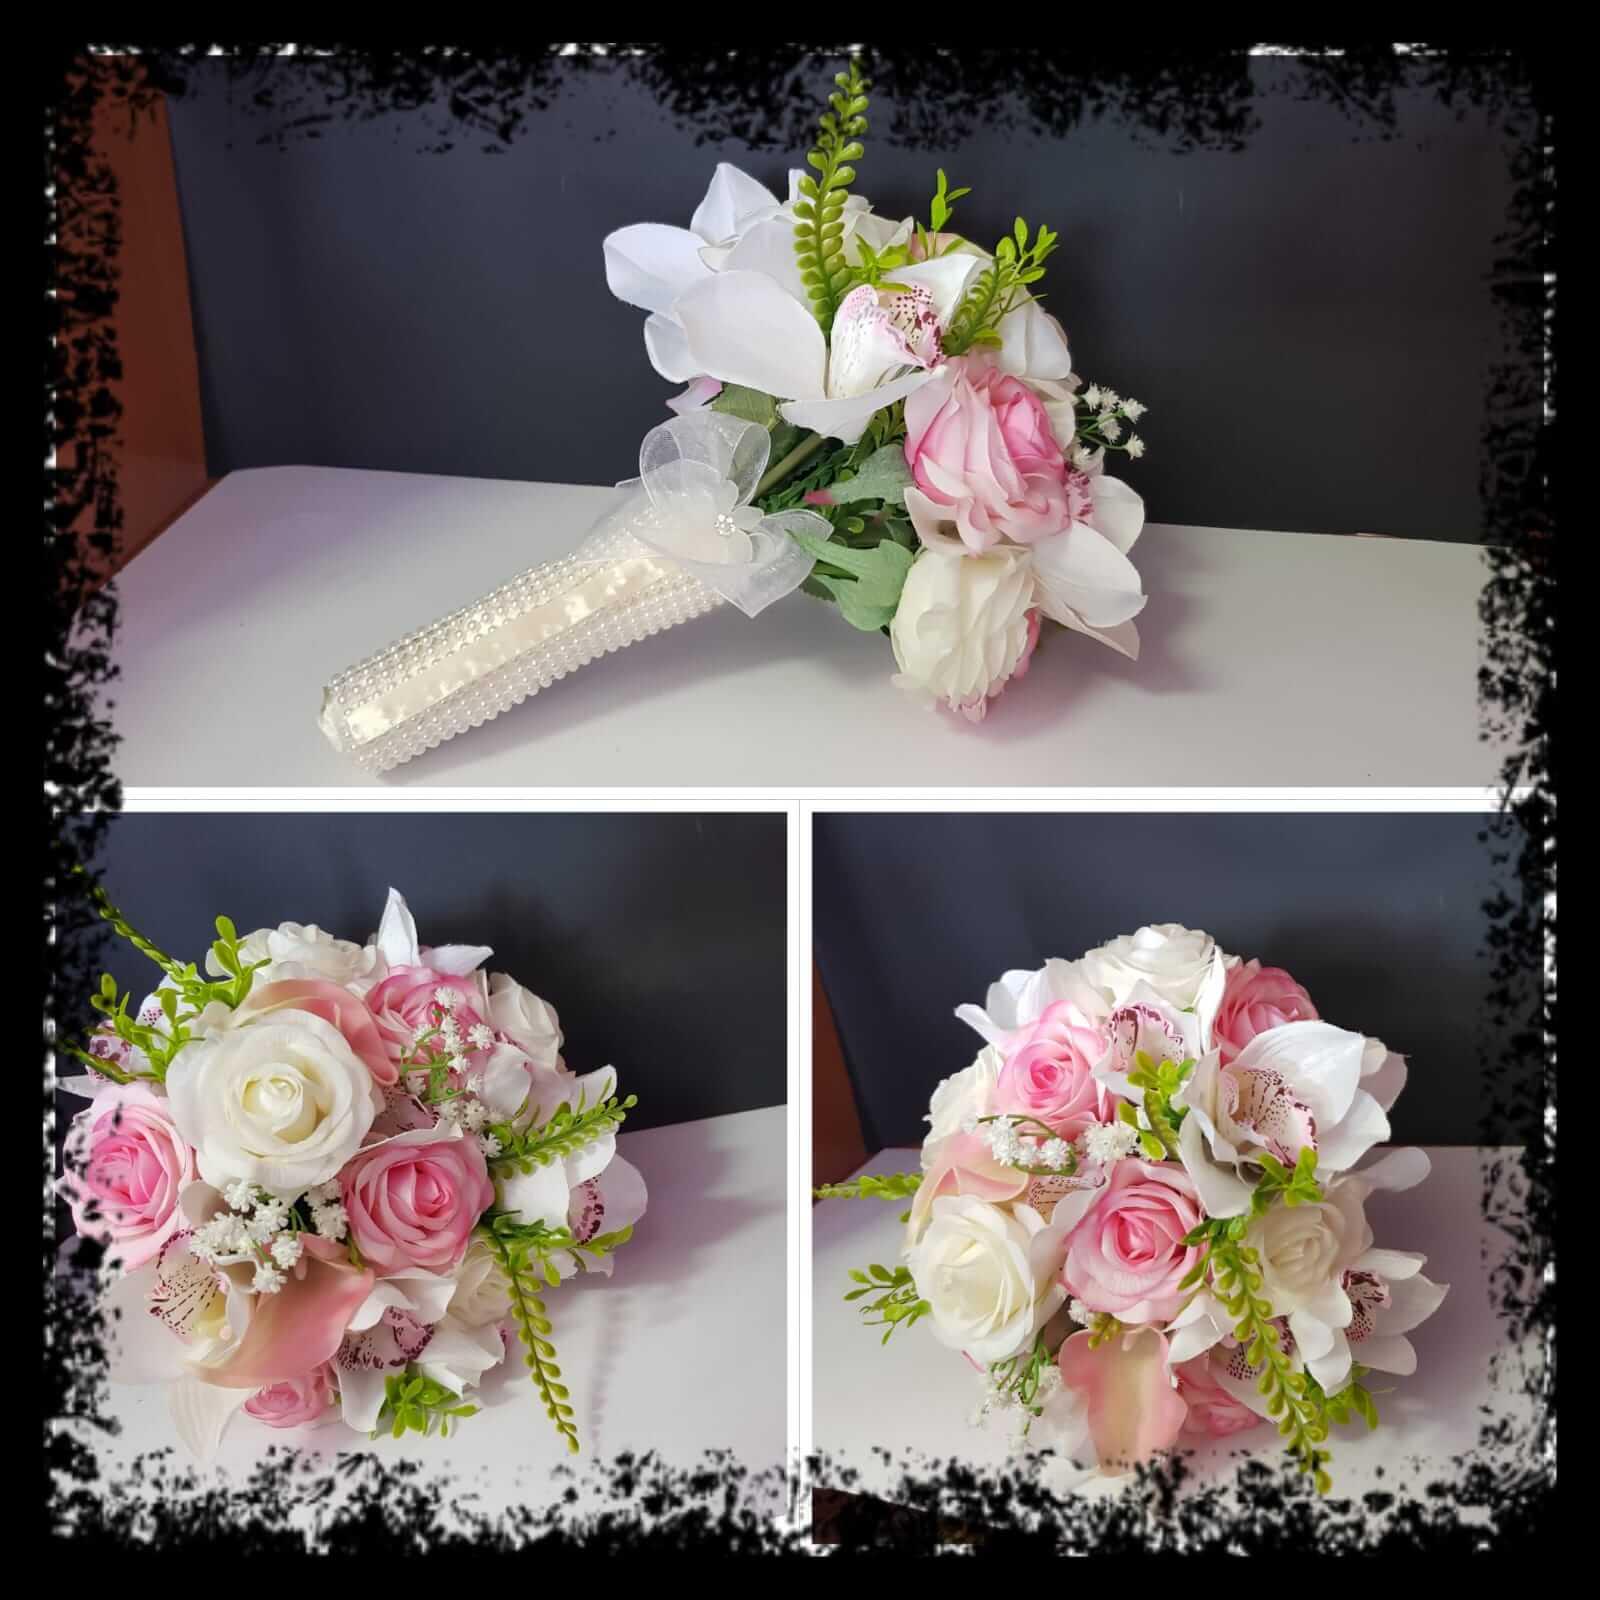 ramo de novia ramo de novia - ramos novia 10 - Ramo de novia